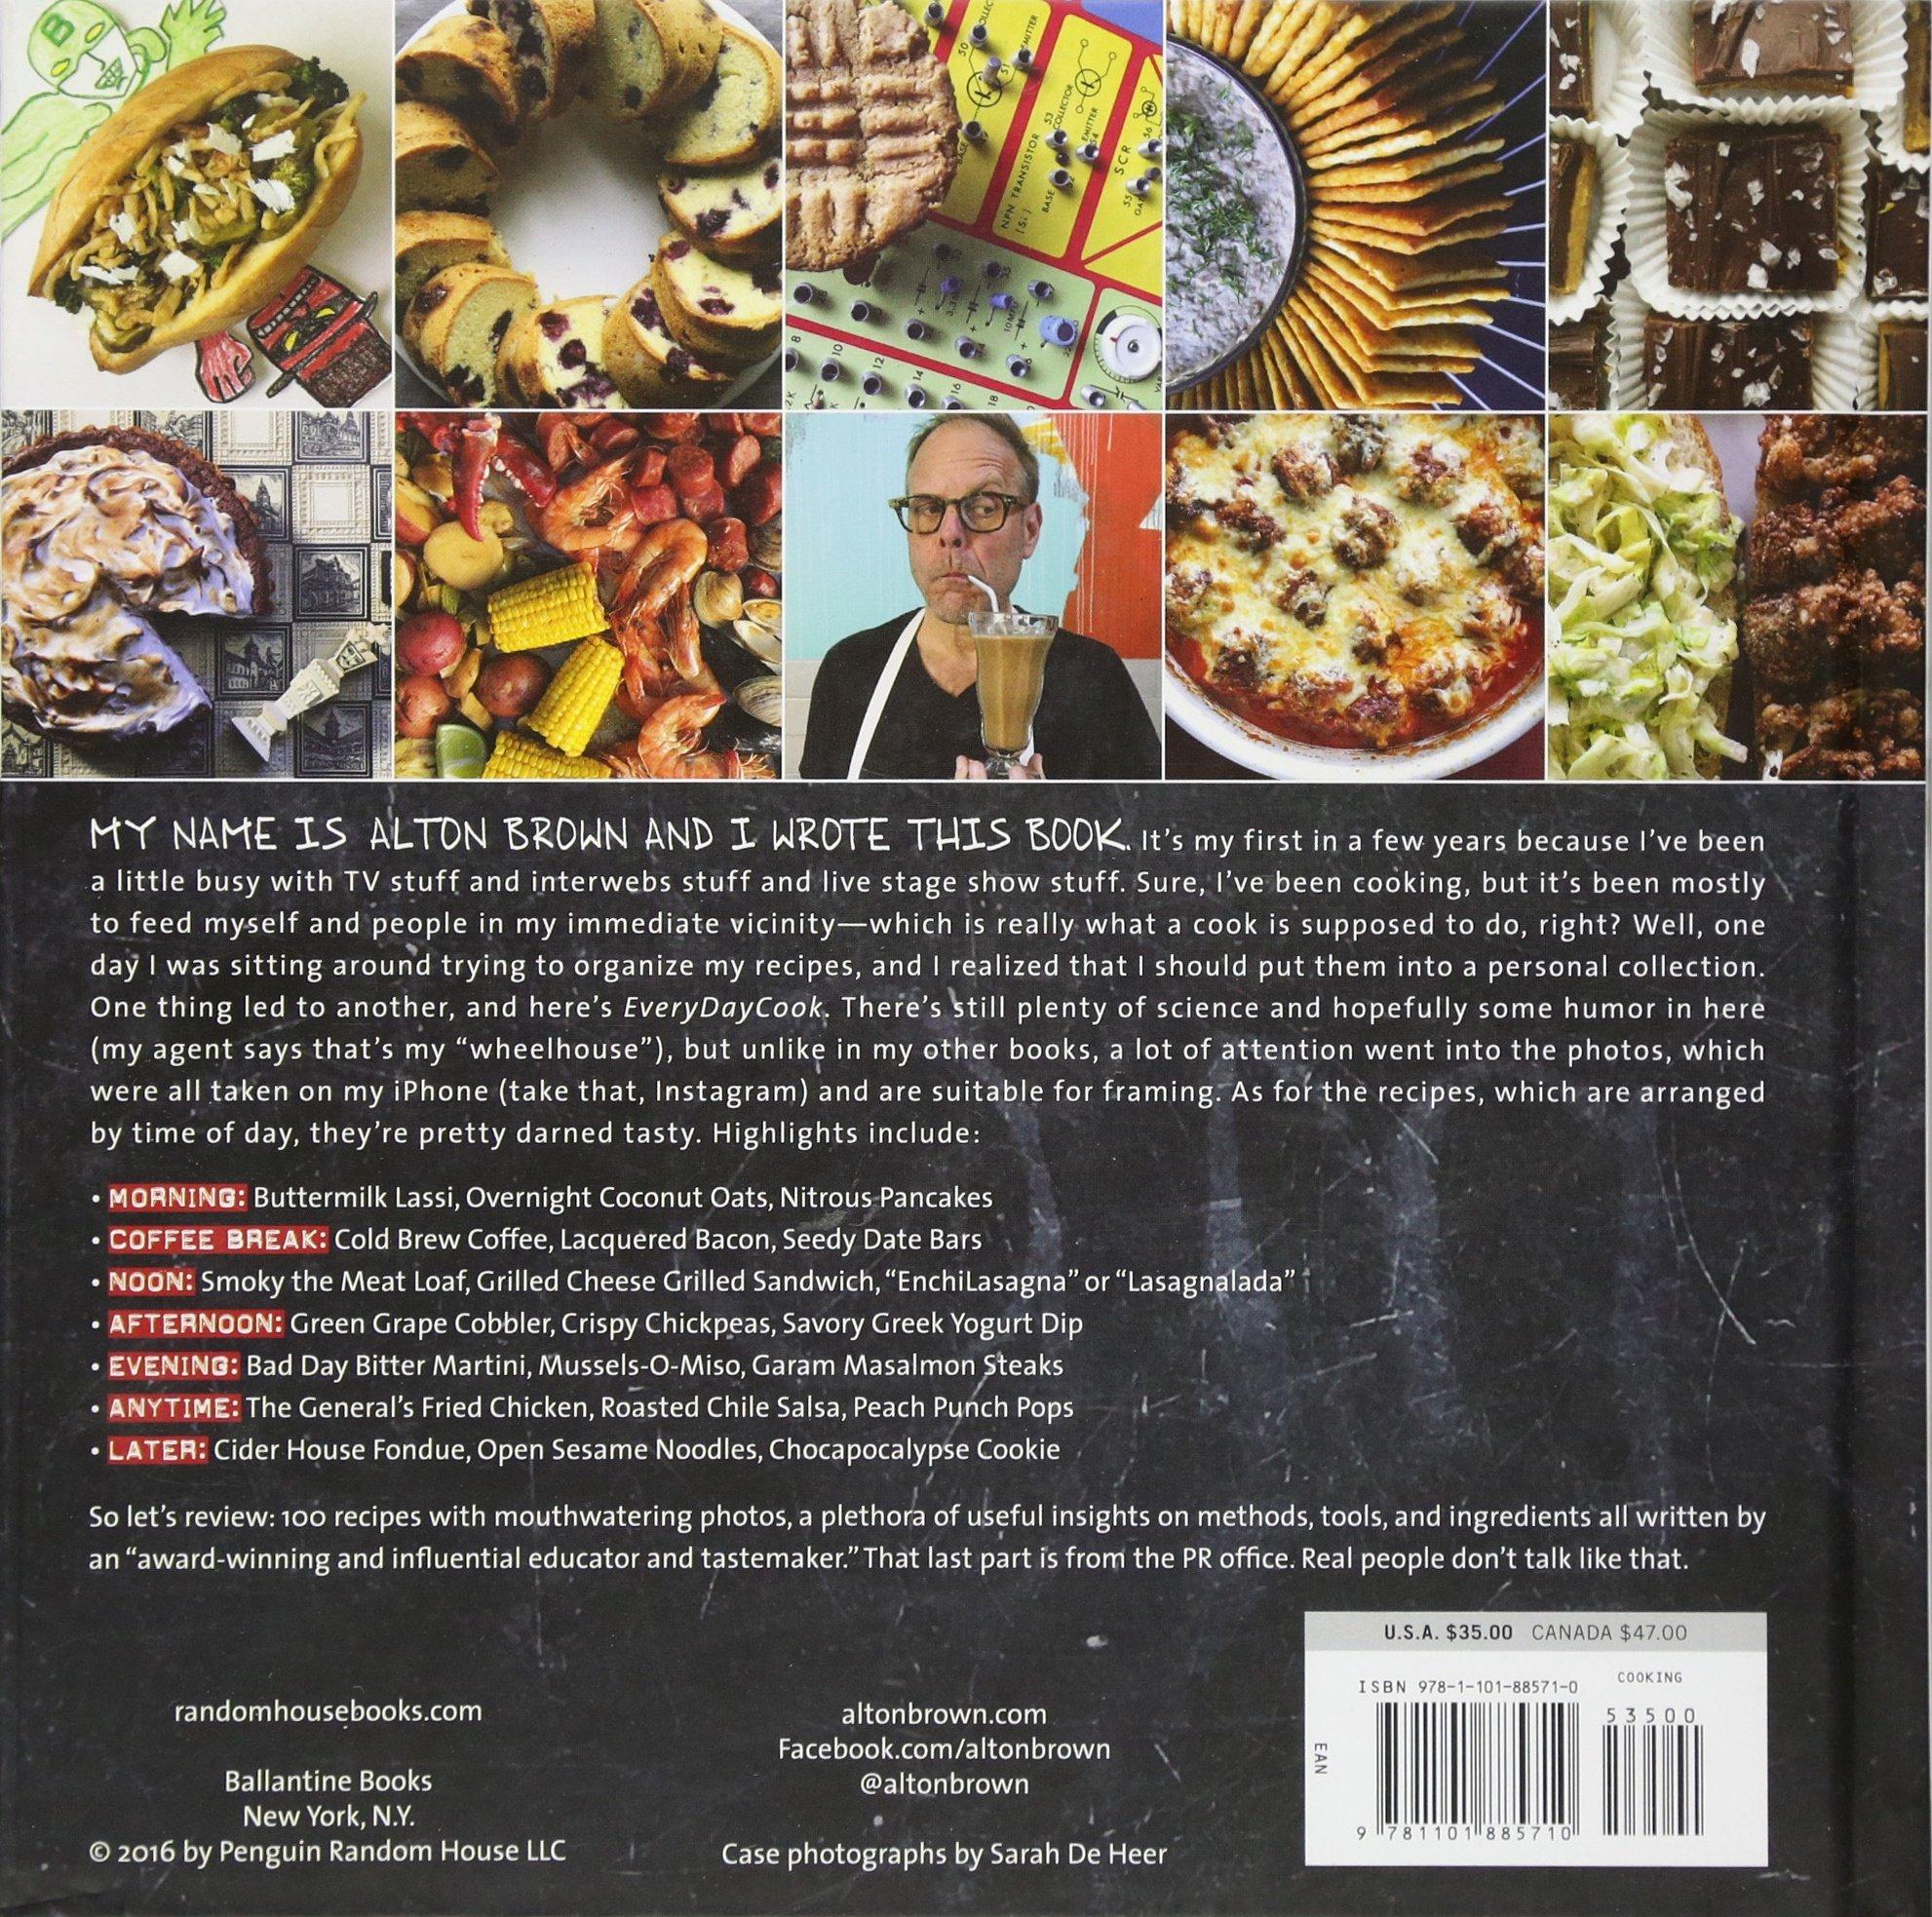 Alton Brown Everydaycook A Cookbook Brown Alton 9781101885710 Amazon Com Books